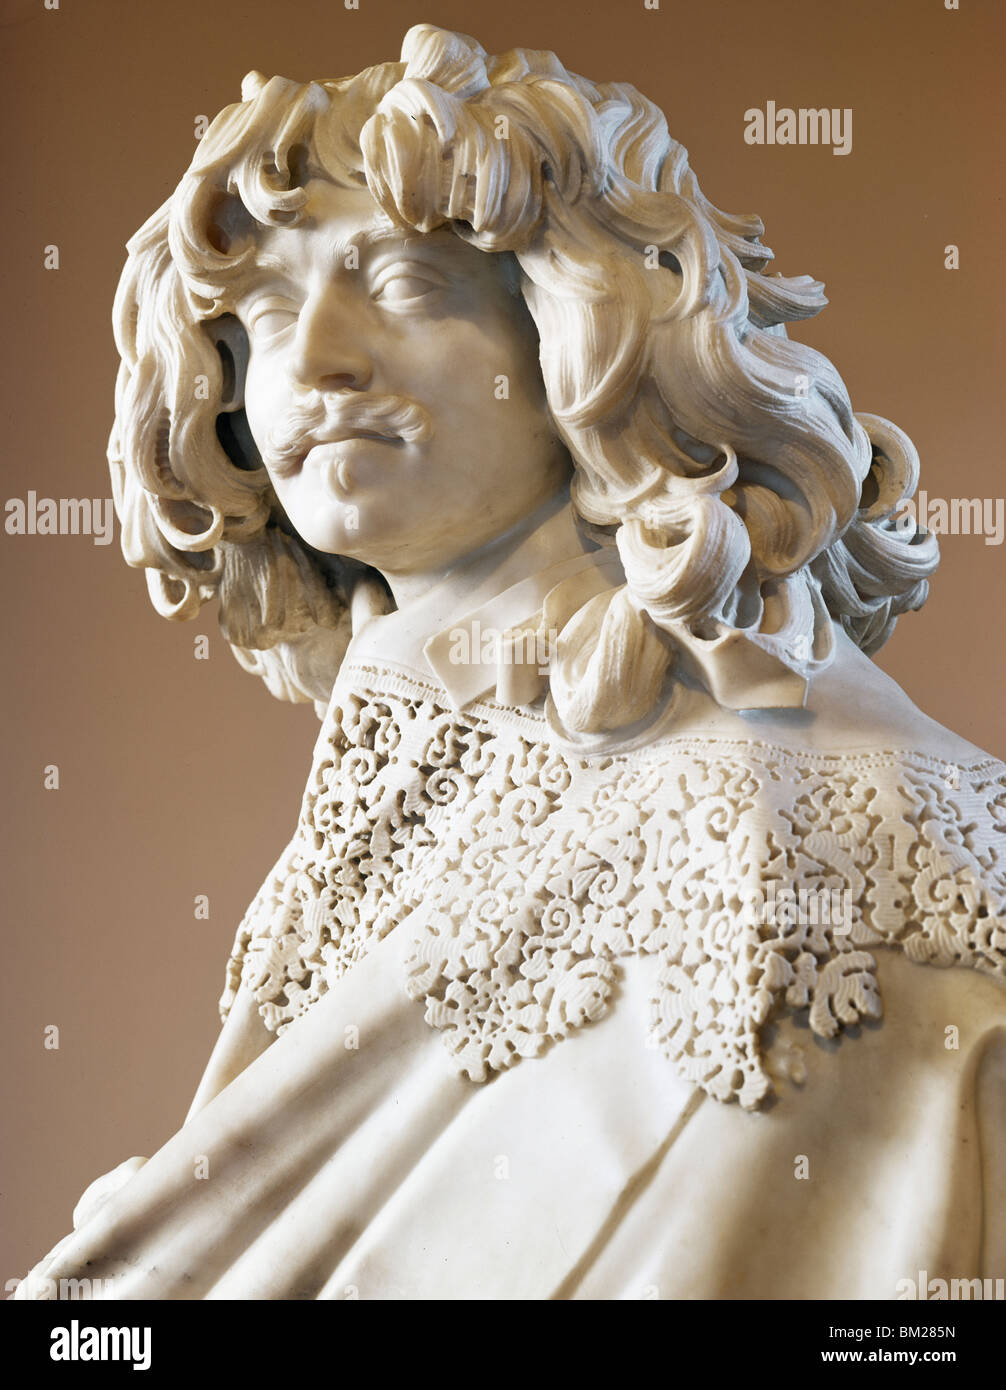 Thomas Baker by Gian Lorenzo Bernini,  marble sculpture,  circa 1638,  (1598-1680) - Stock Image